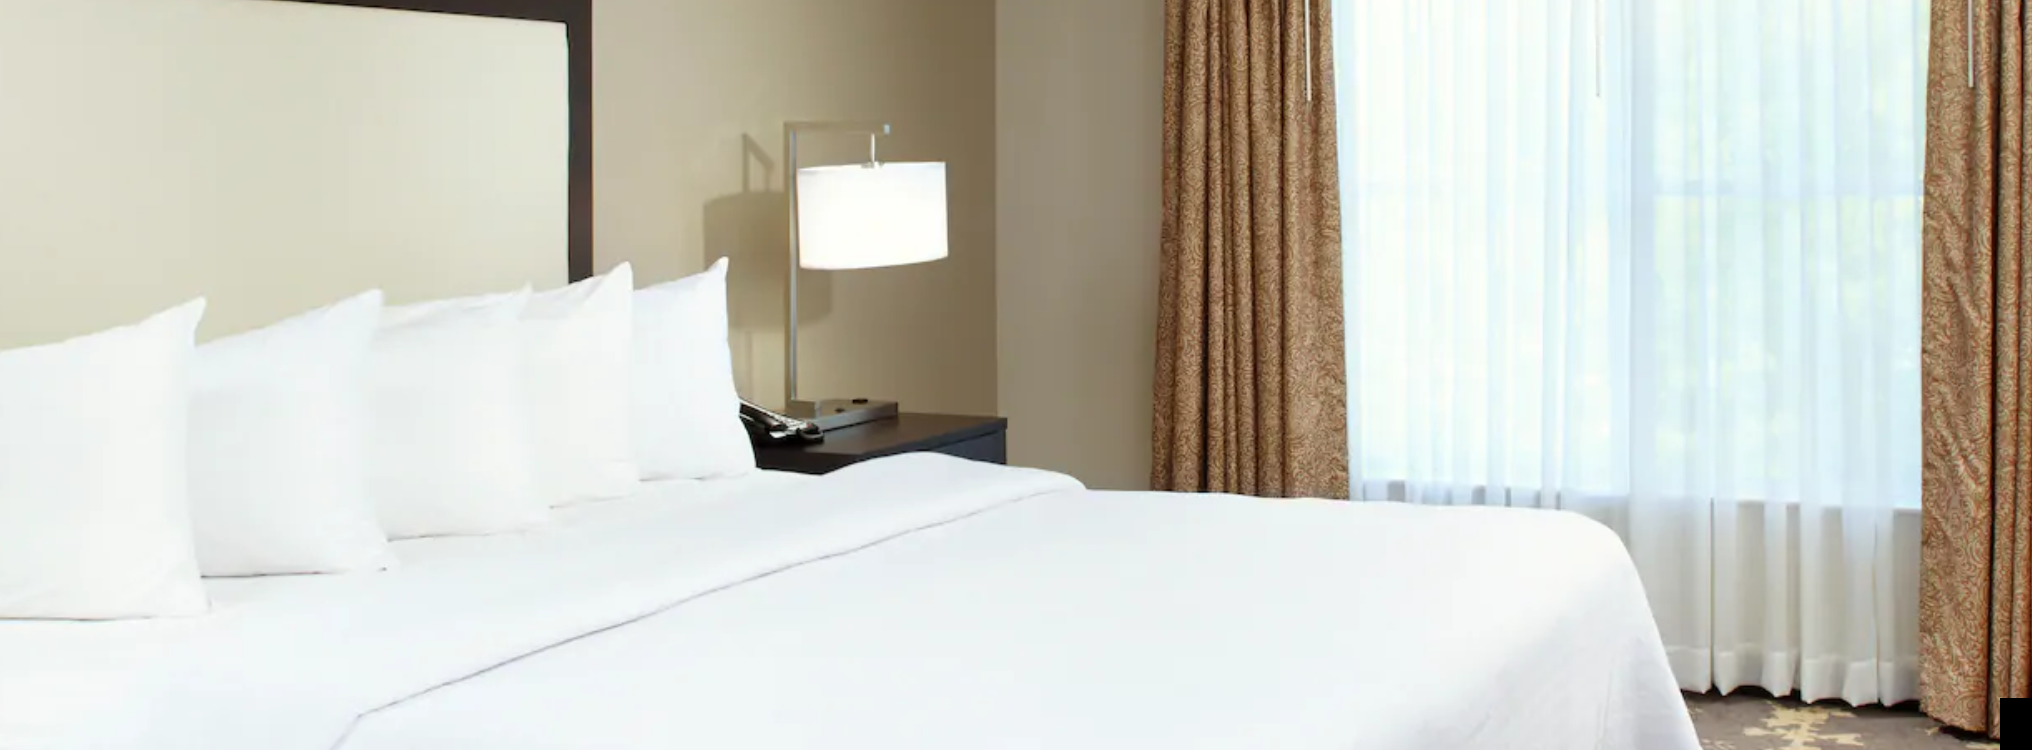 https://www.hotelsbyday.com/_data/default-hotel_image/3/18208/screenshot-2020-06-11-at-4-22-40-pm.png